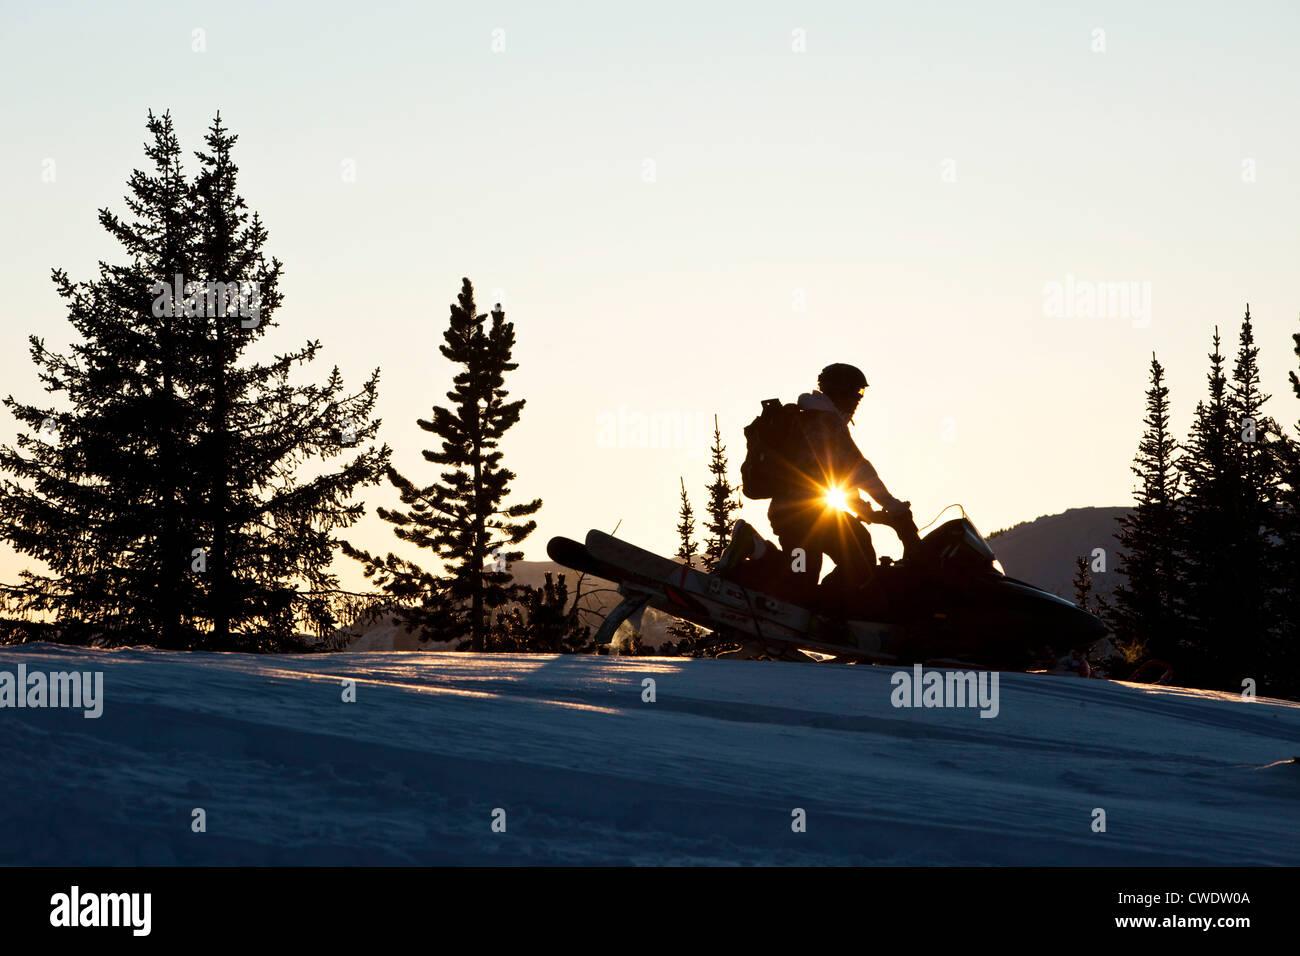 Un joven atlético snowmobiling al atardecer en Montana. Foto de stock